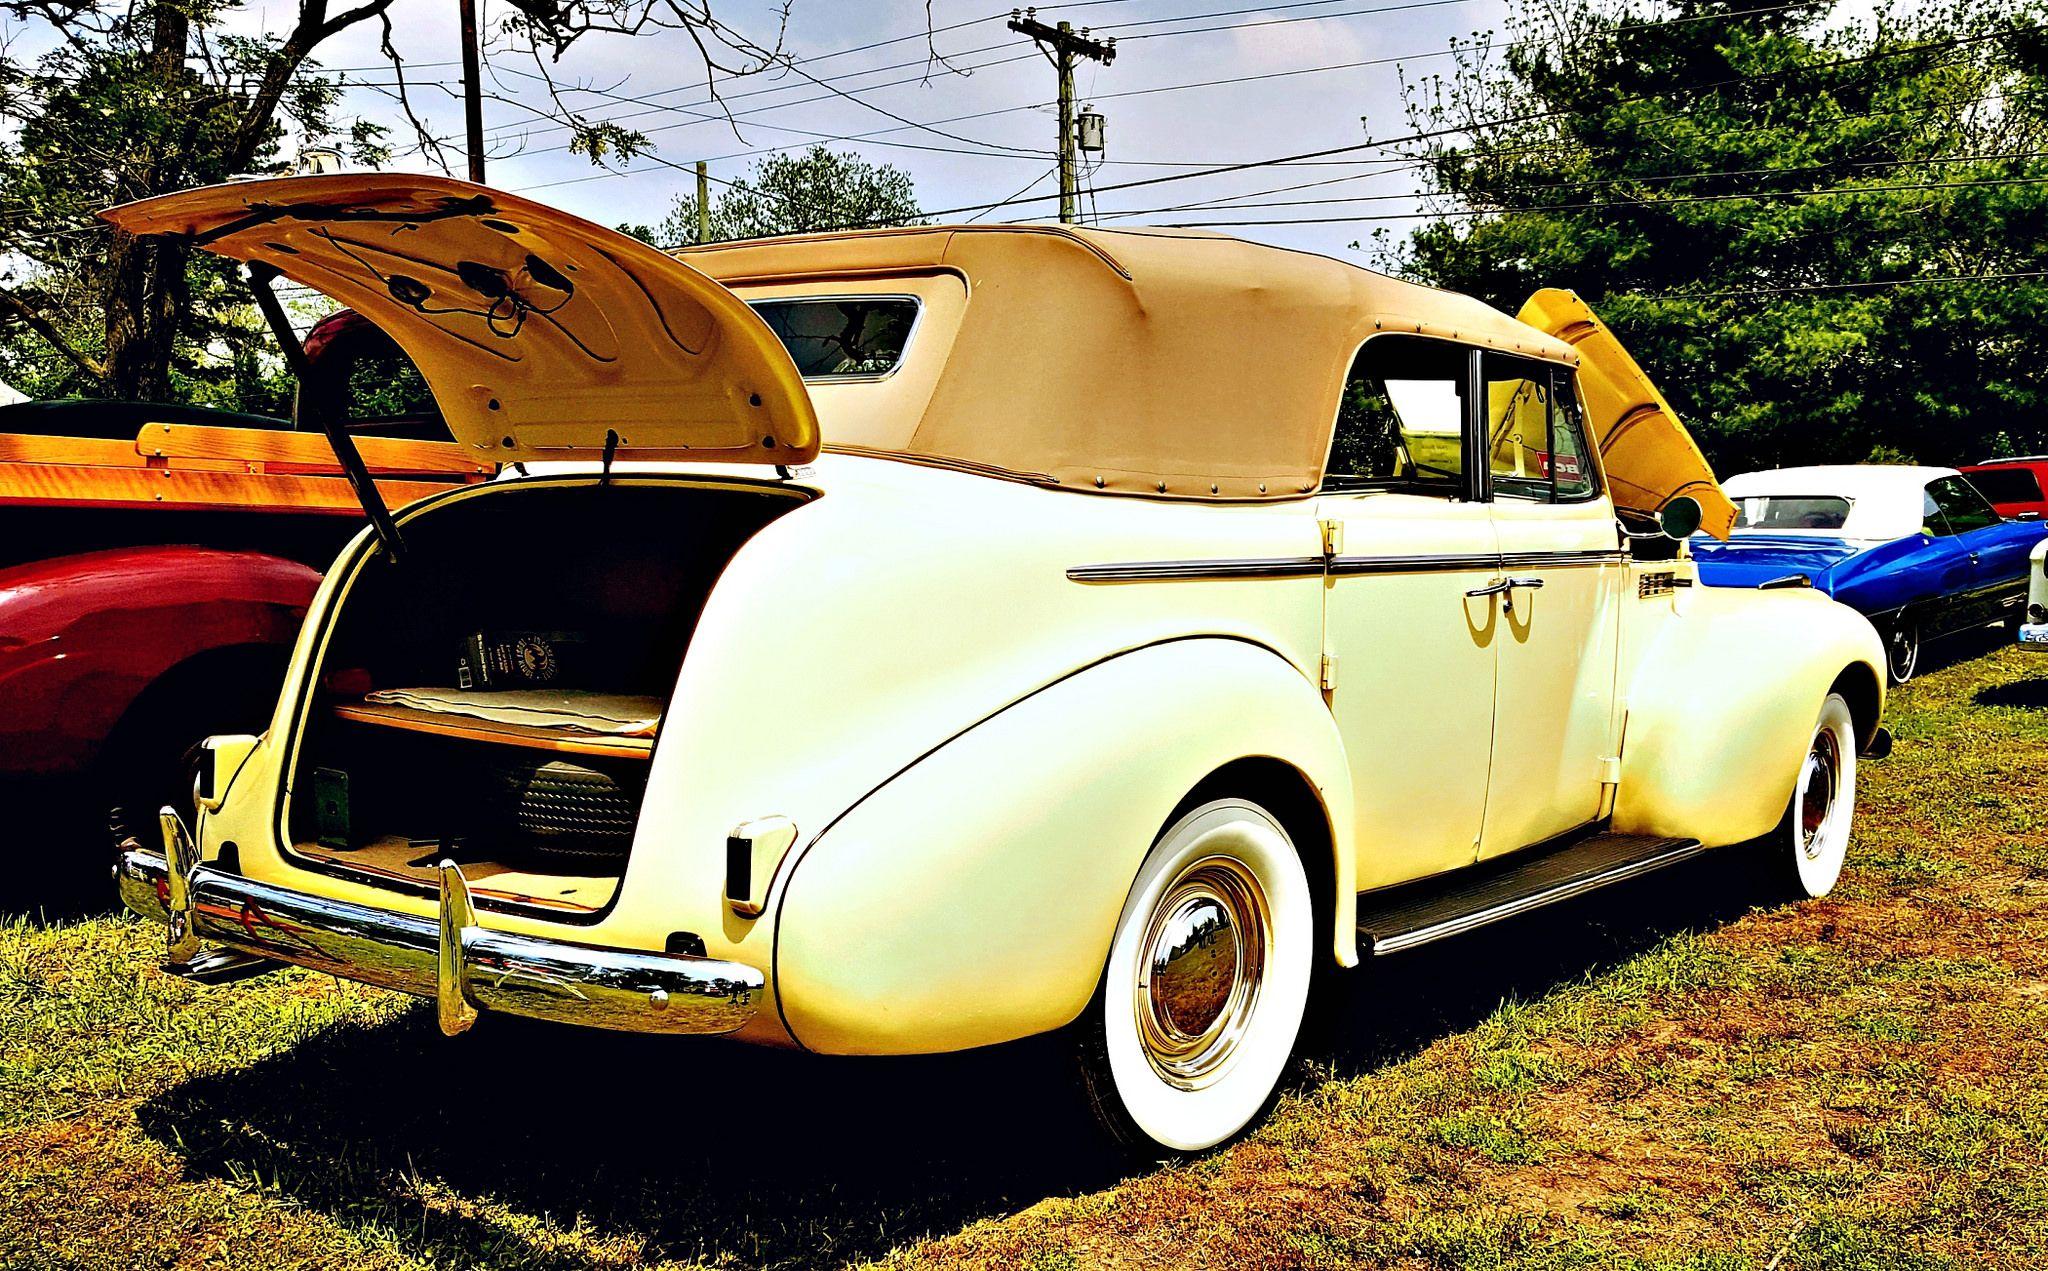 1940 Buick Phaeton | Delaware and Cars